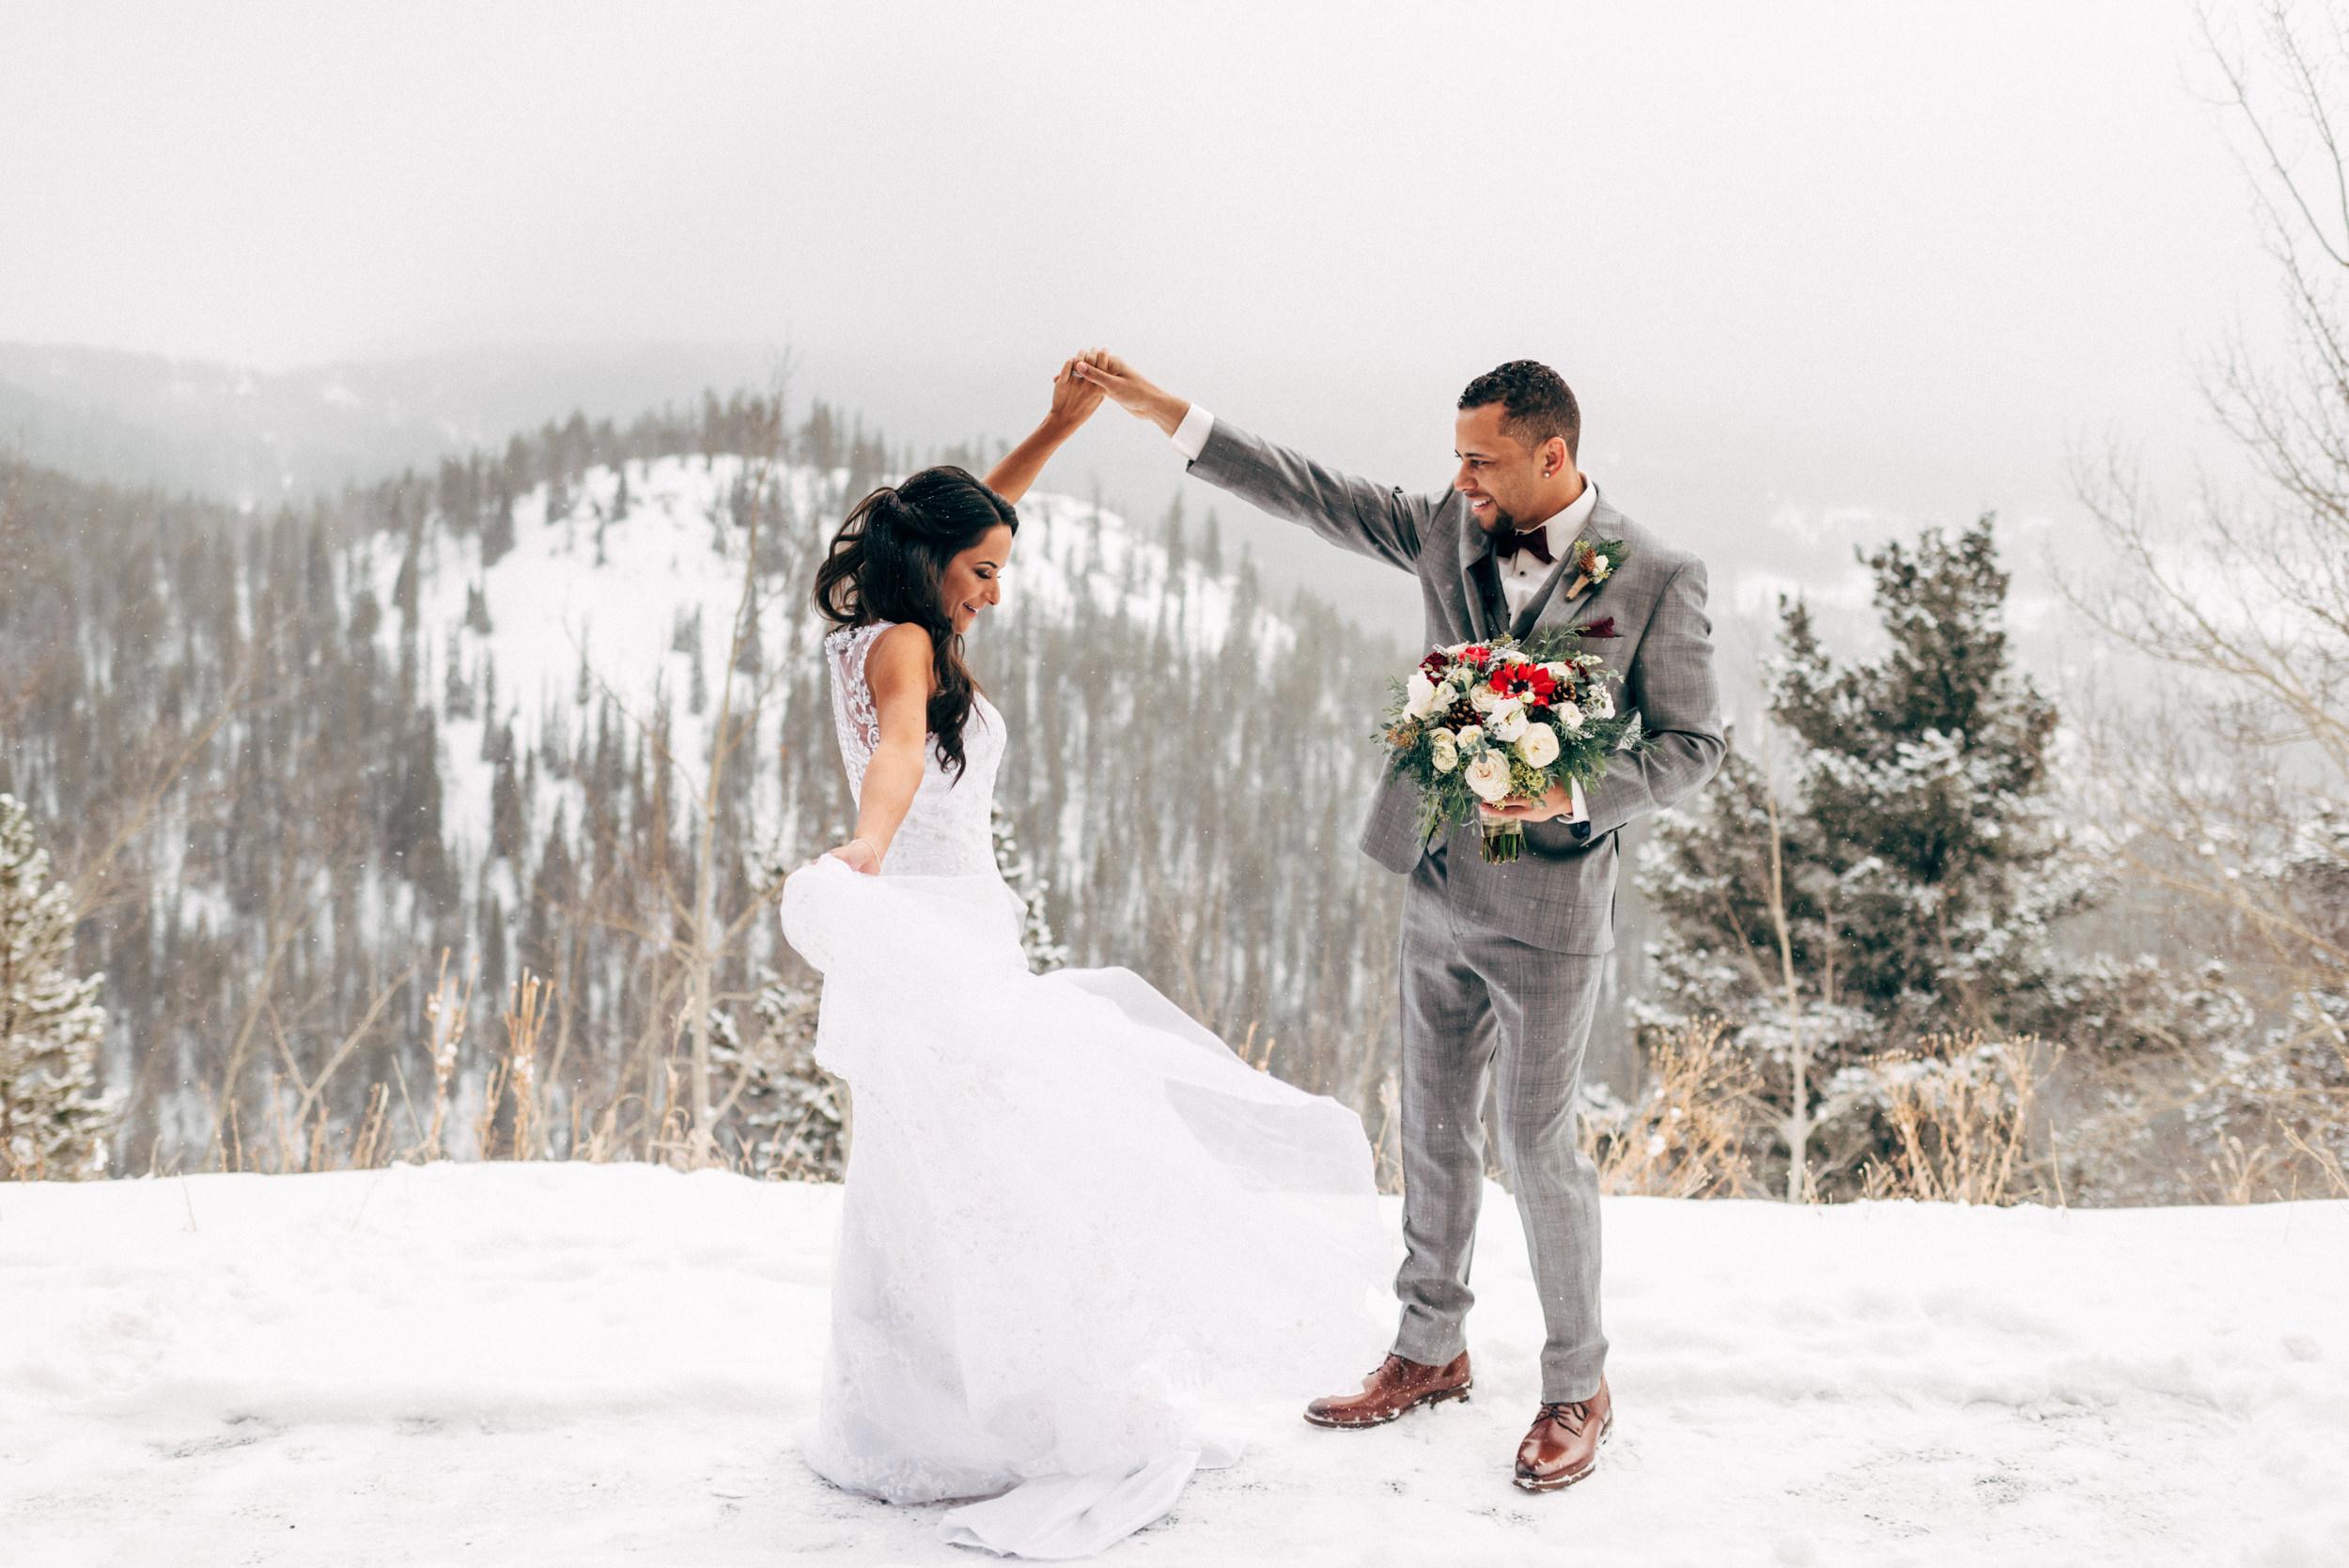 Colorado-wedding-photographer-48.jpg